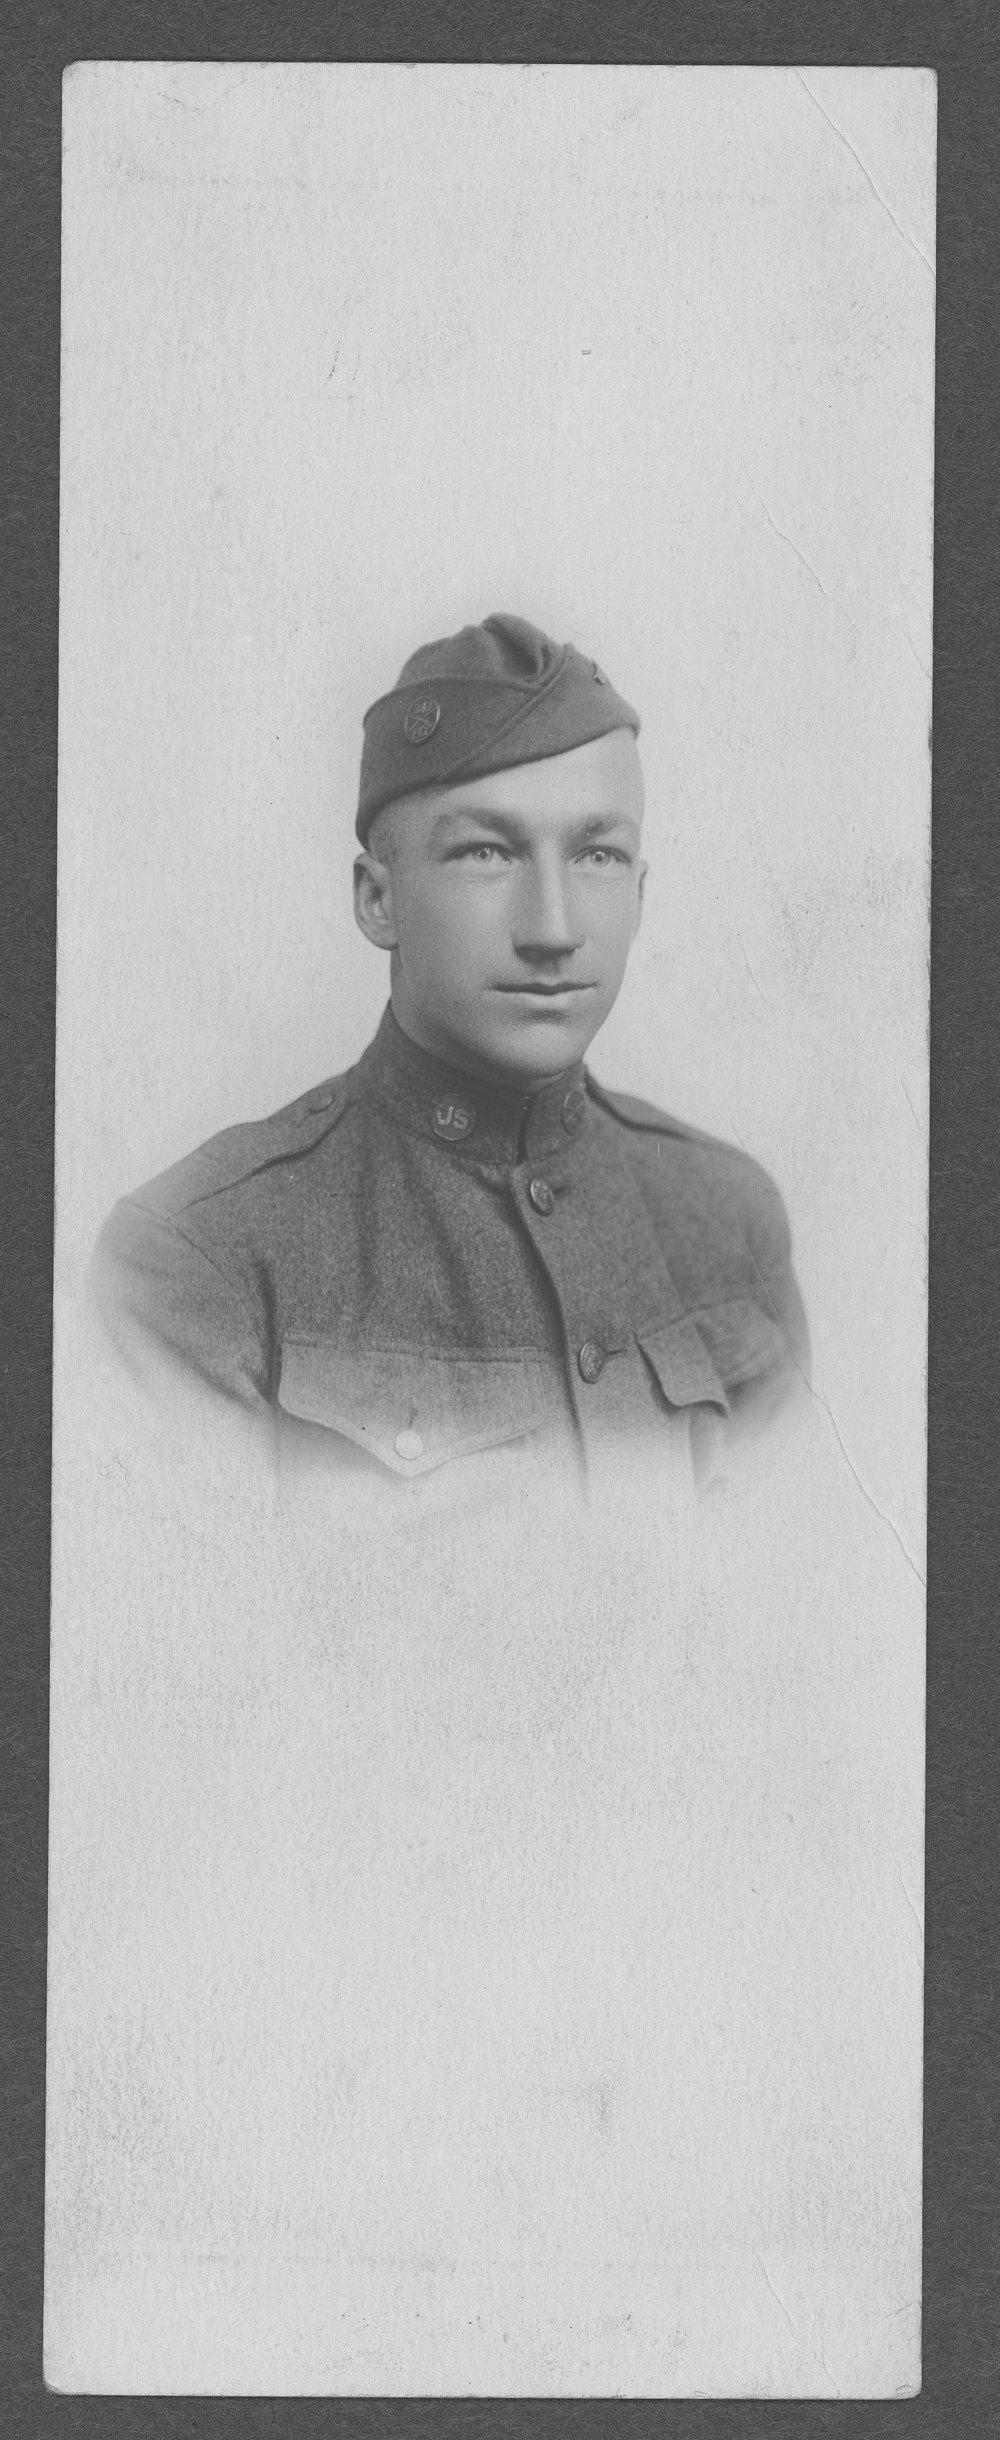 Ray Marion McCosh, World War I soldier - 11